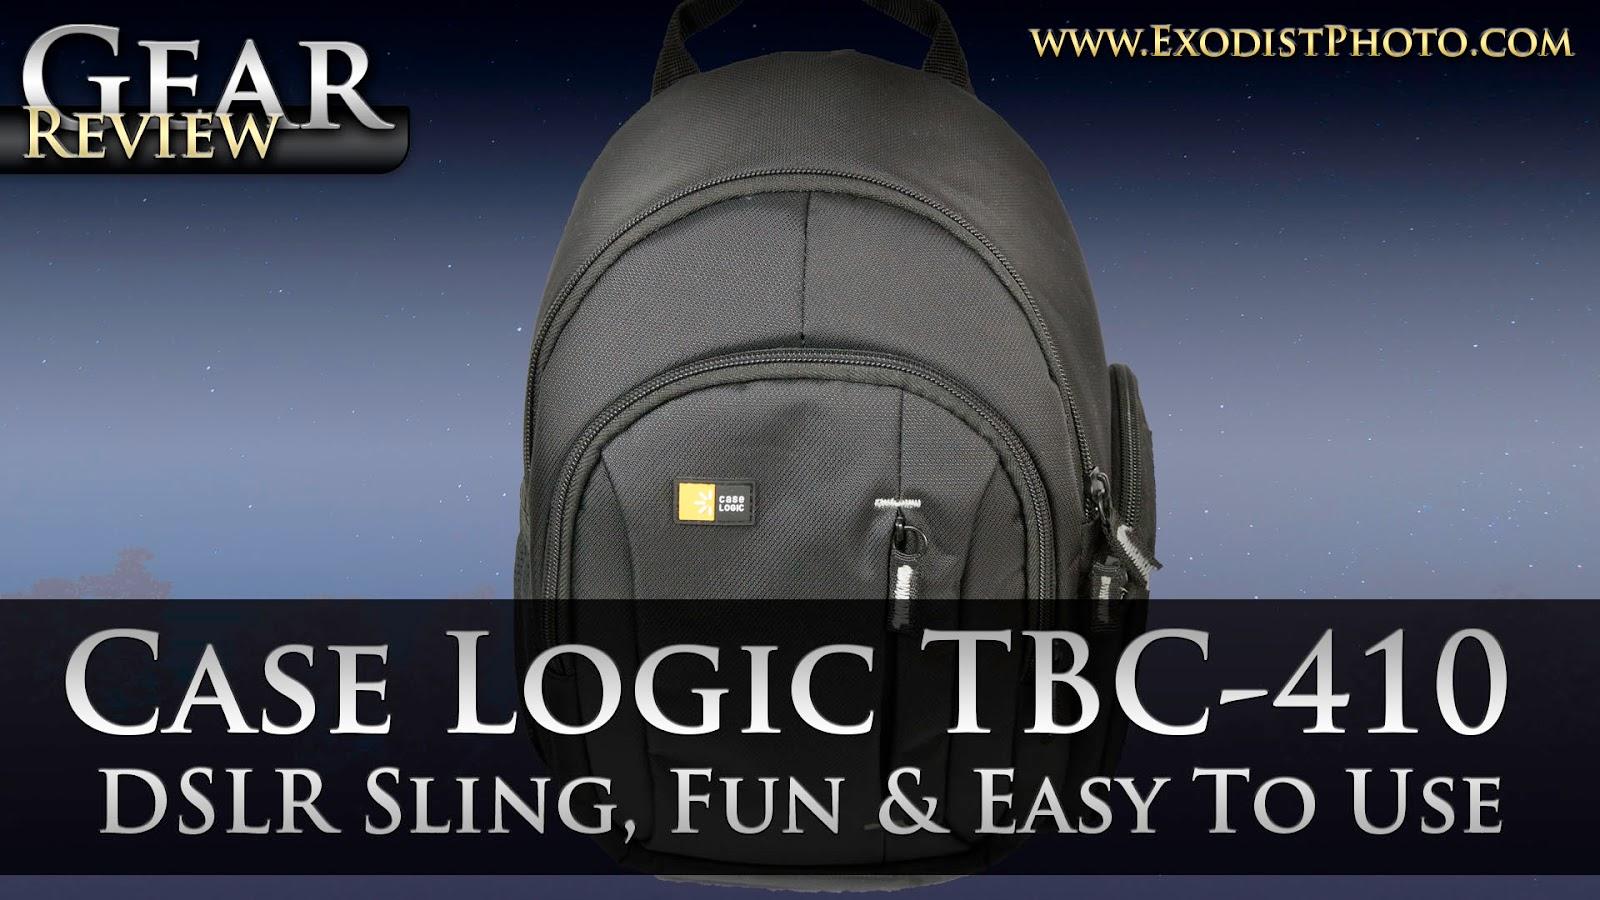 amp; Backpack TBC 410 Sling To Use Easy Logic Fun Camera Case DSLR U685qYxwUR